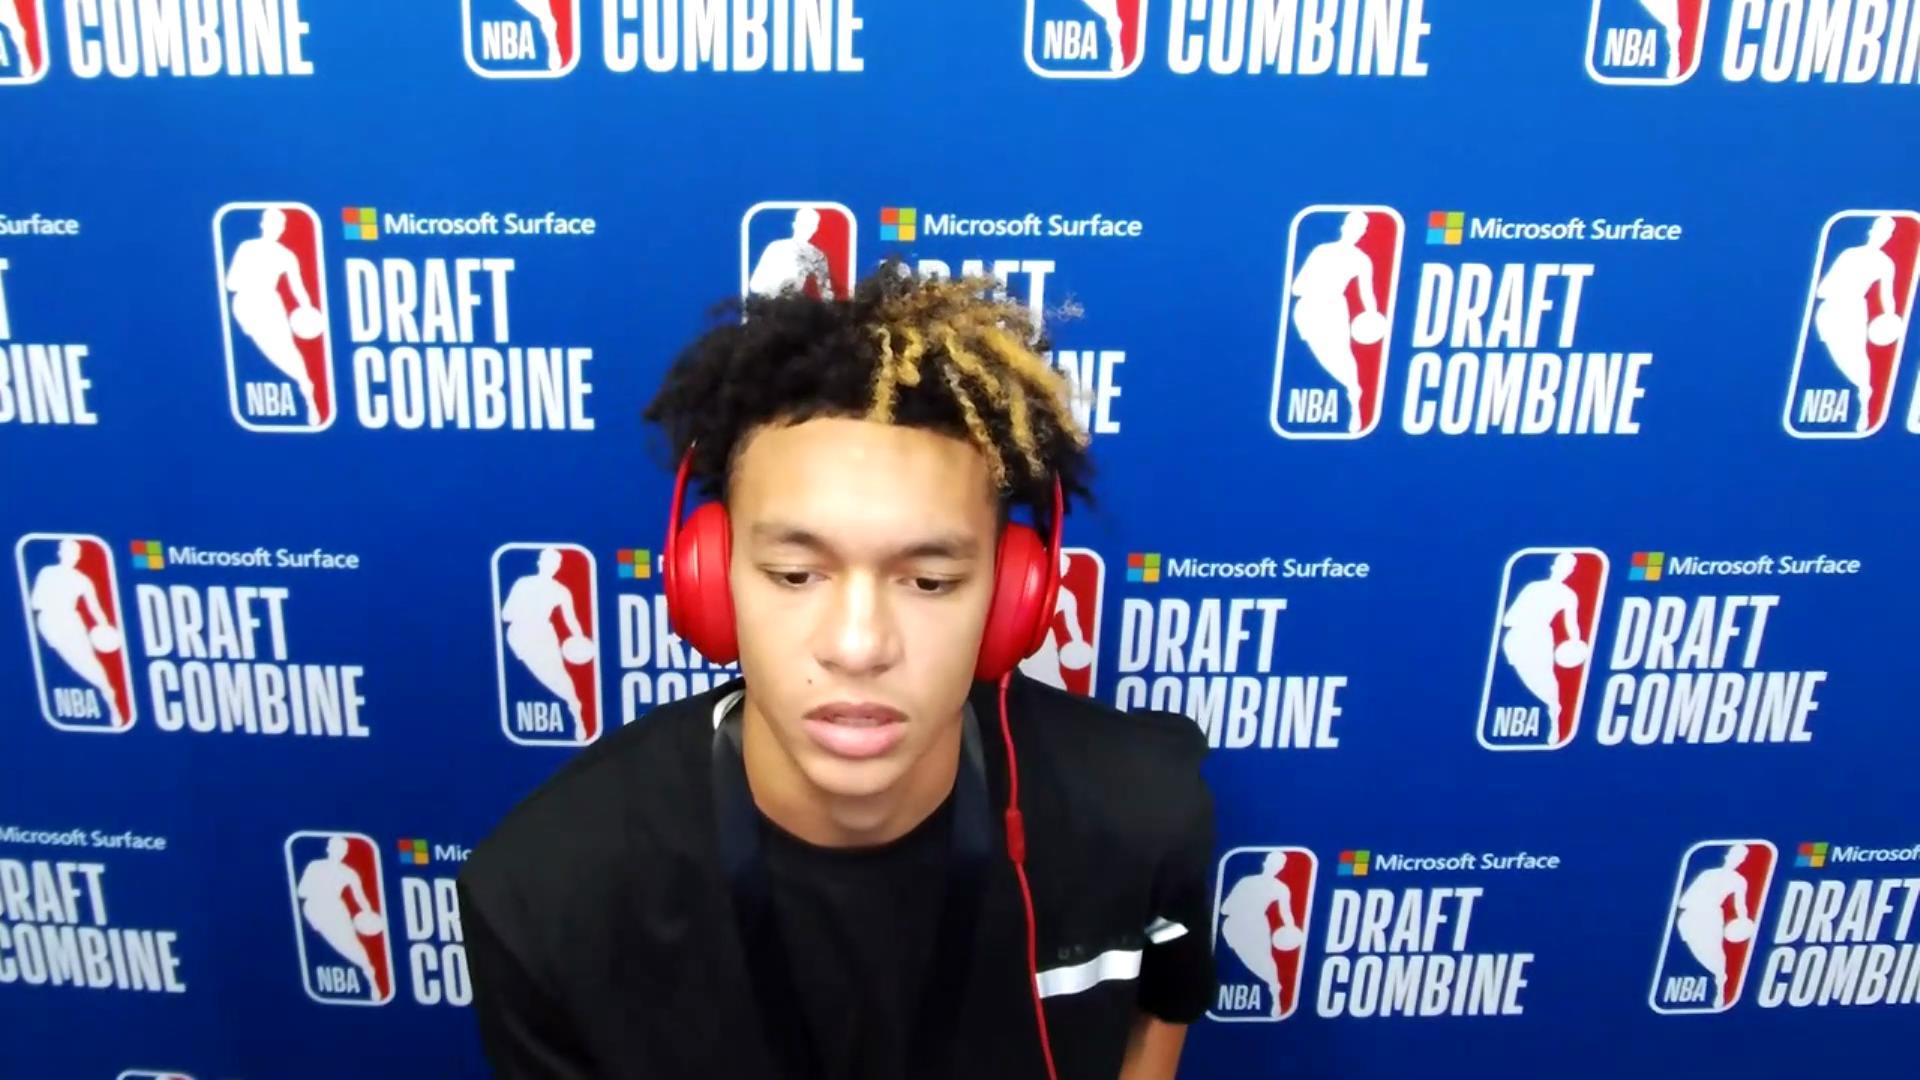 Tre Mann NBA Combine Zoom Interview